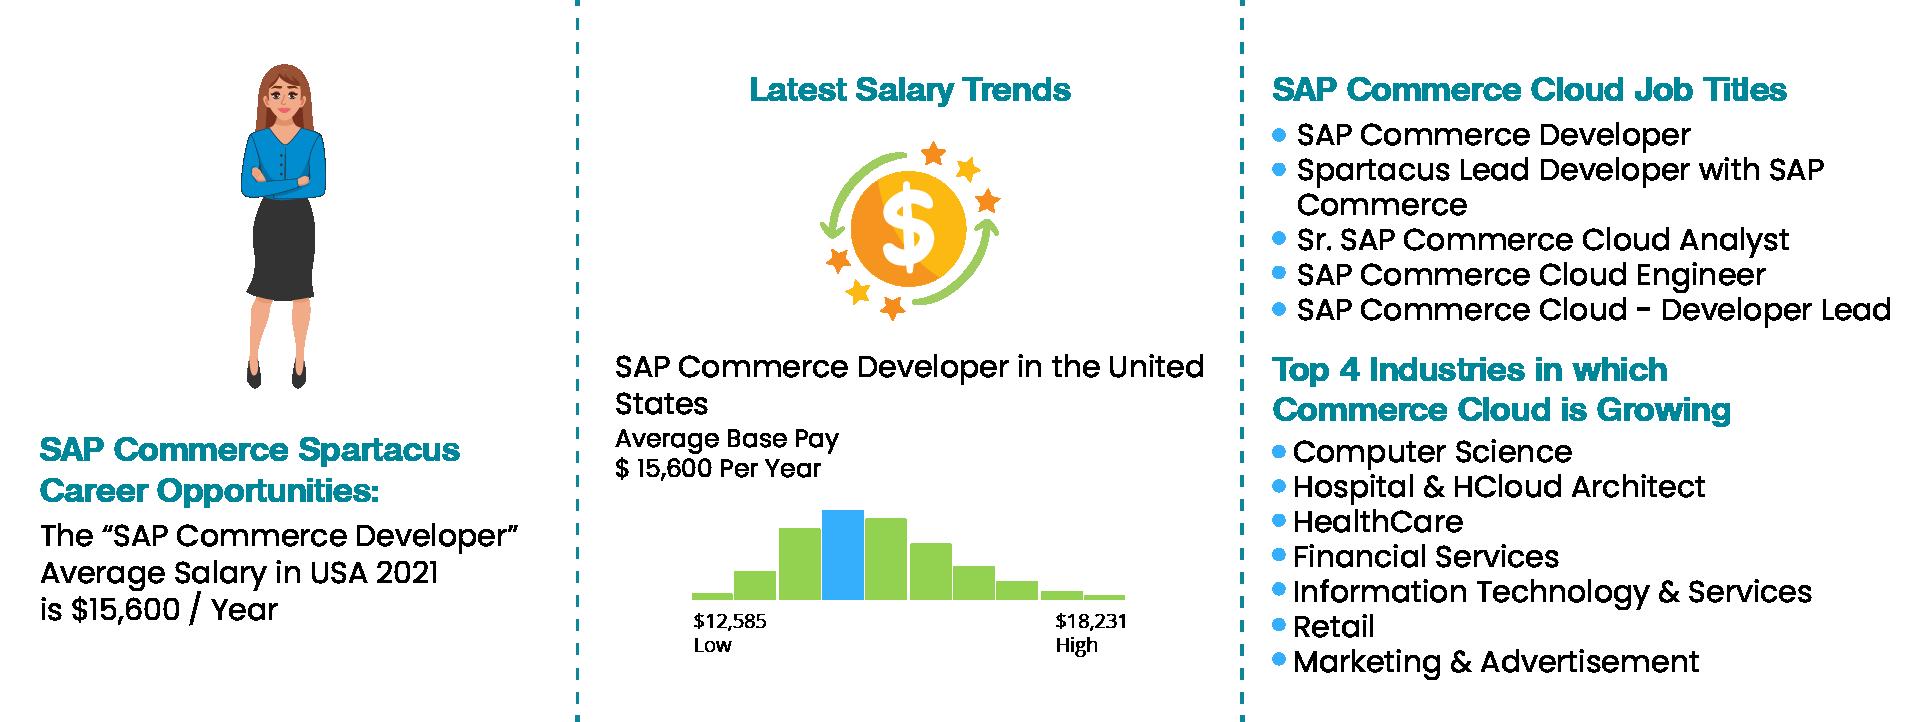 Oracle Integration Cloud Training-Joboutlook|ZaranTech